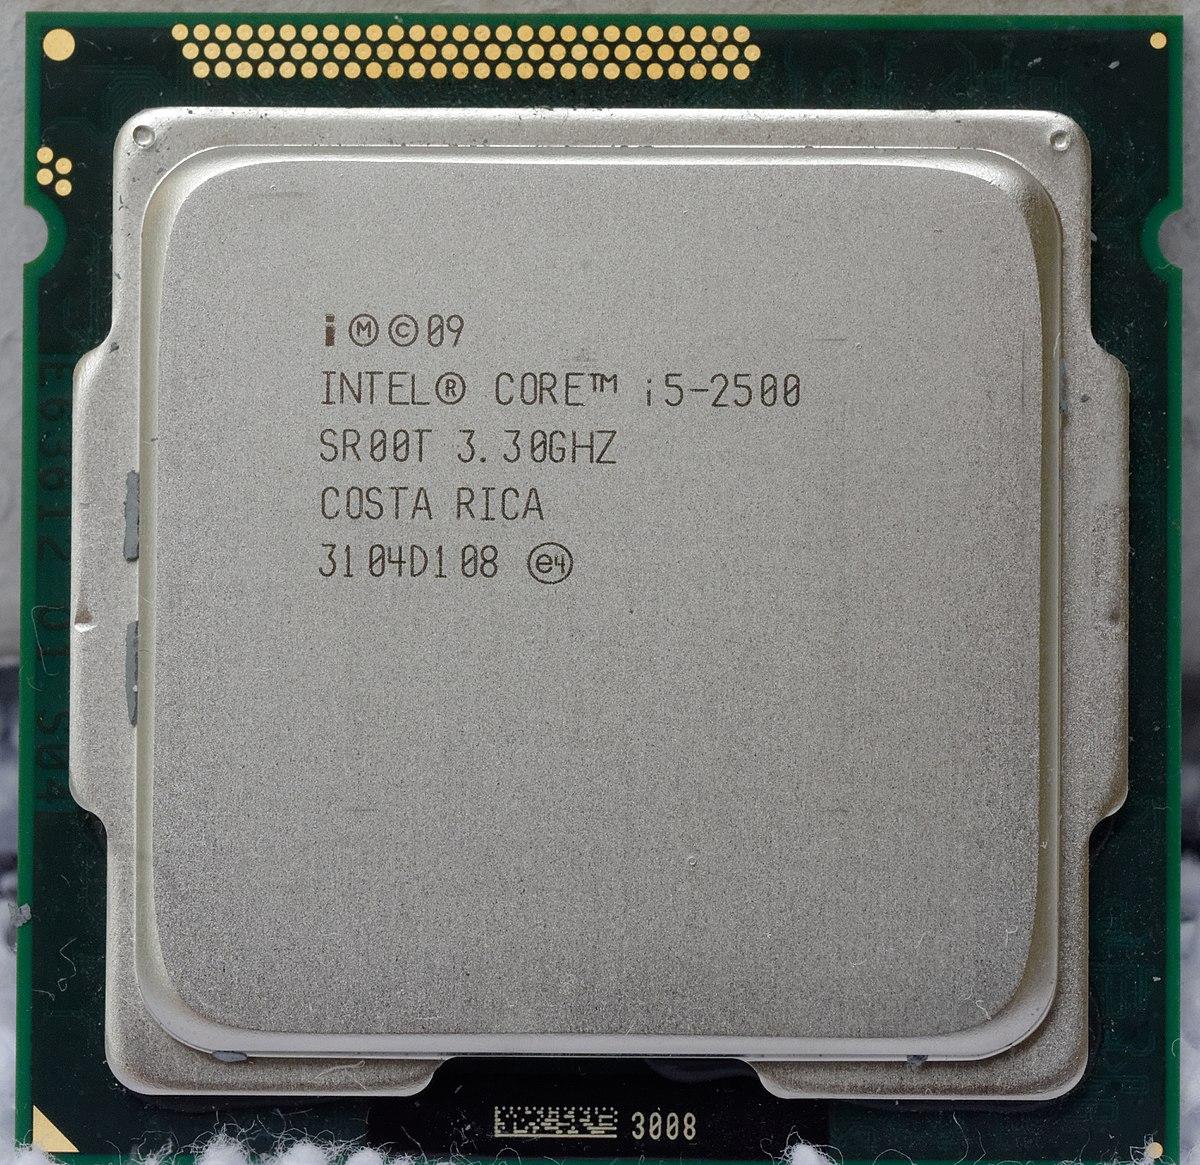 List of Intel Core i5 microprocessors - Wikipedia